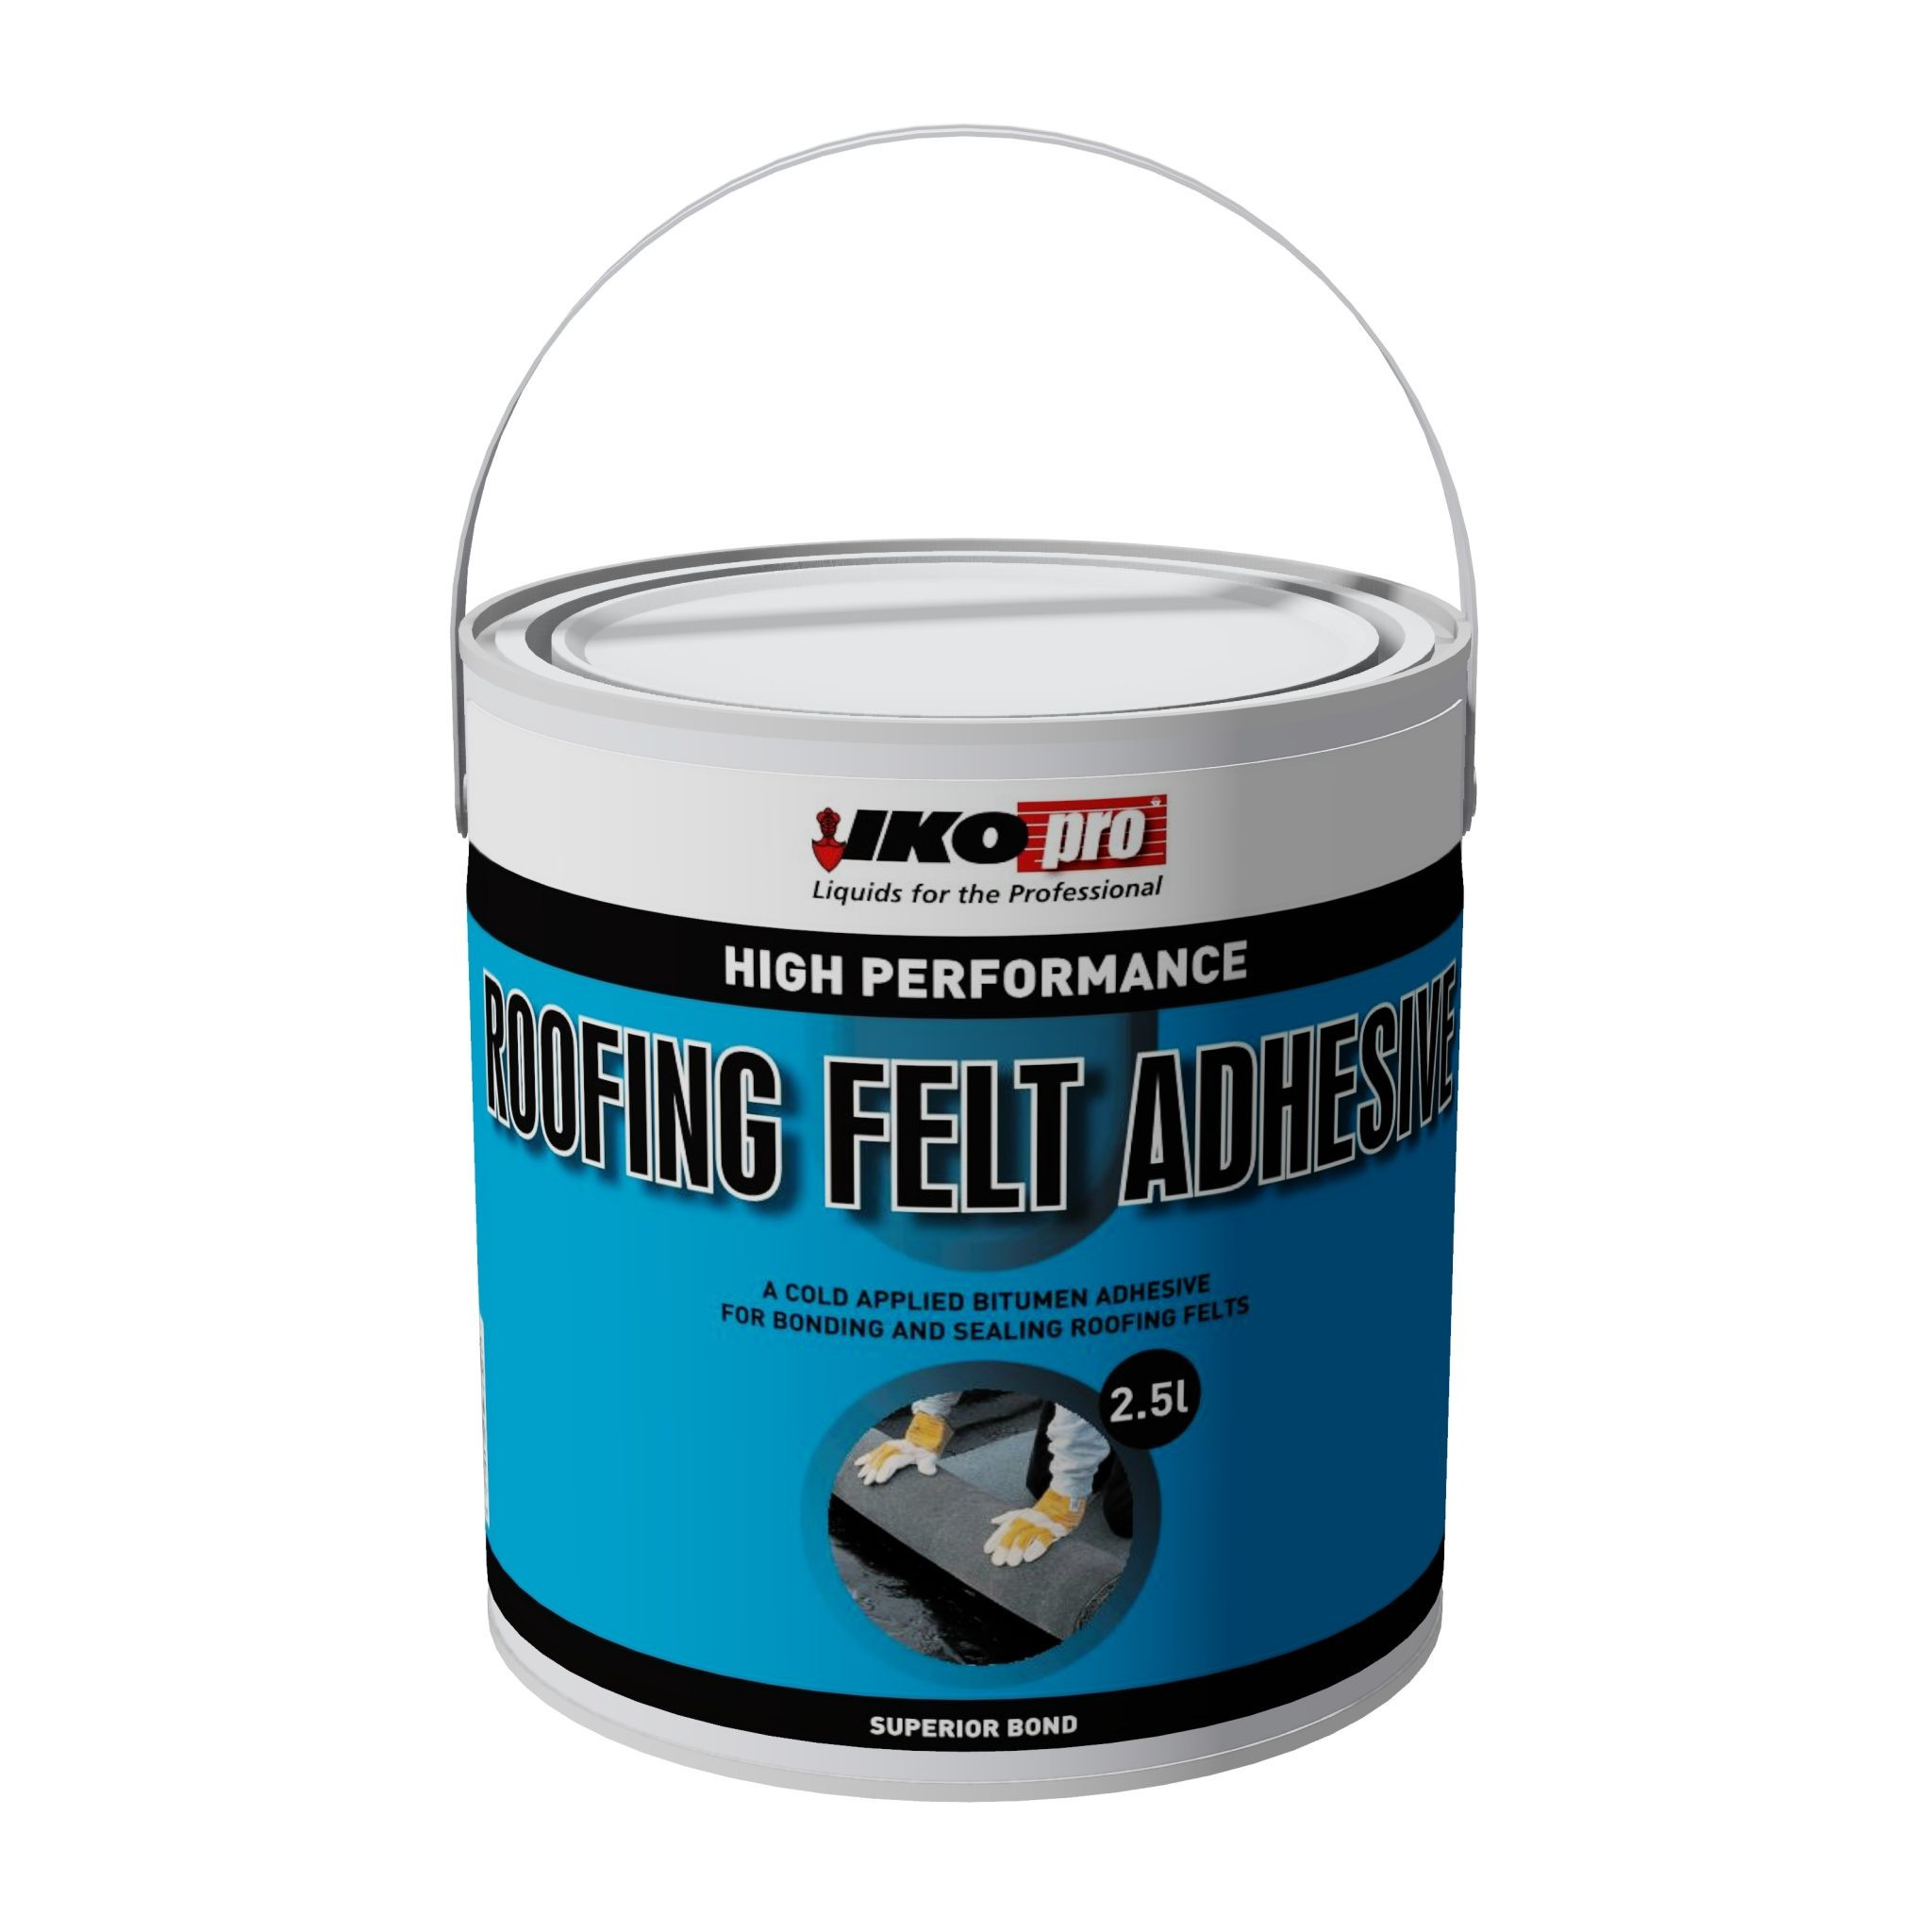 Iko-Pro Roofing Felt Adhesive 2.5Ltr